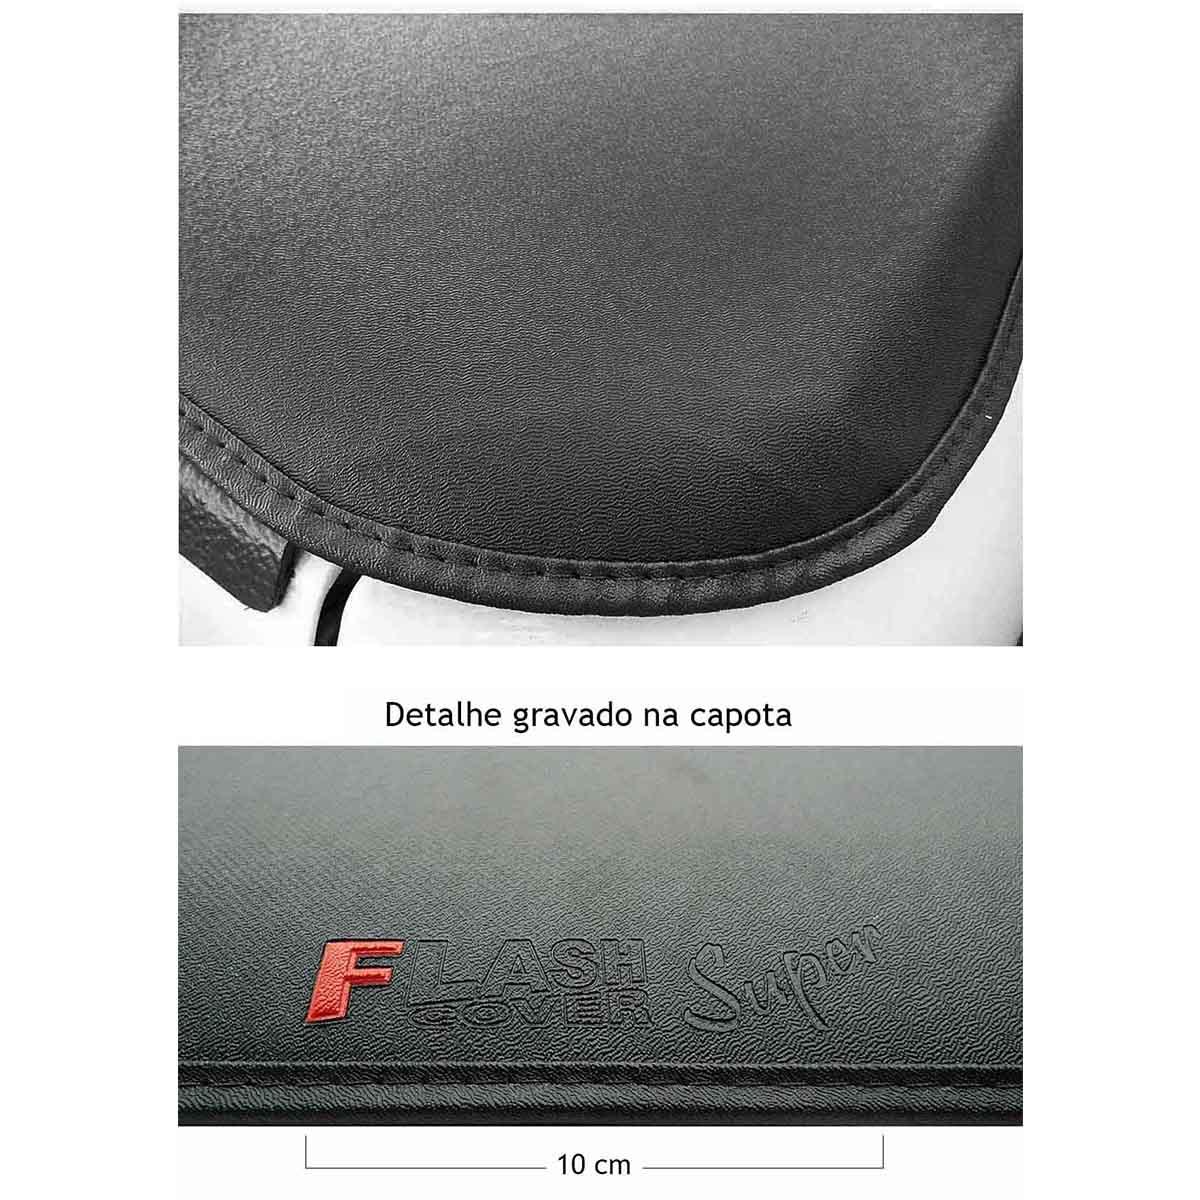 Capota mar�tima super slim S10 cabine dupla 1997 a 2011